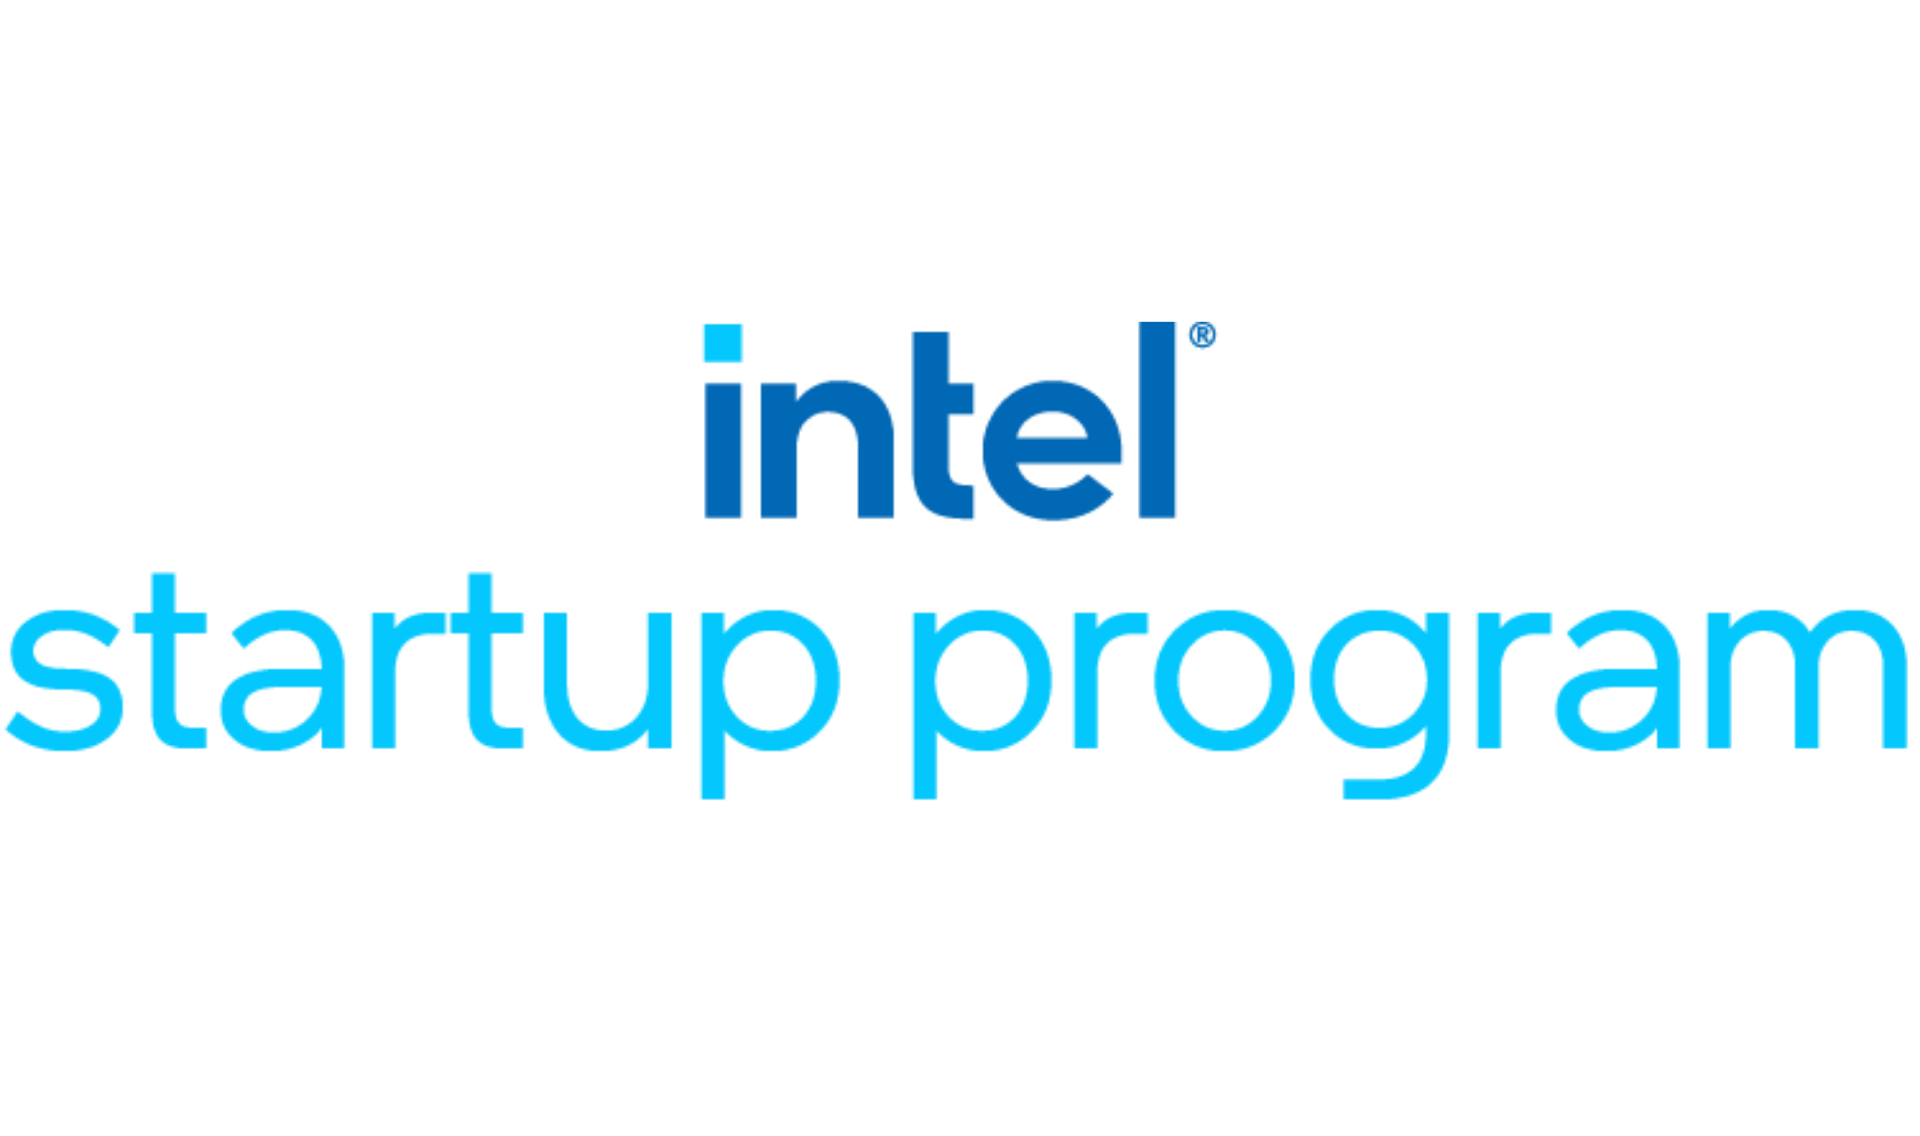 intel_new_logo (6)